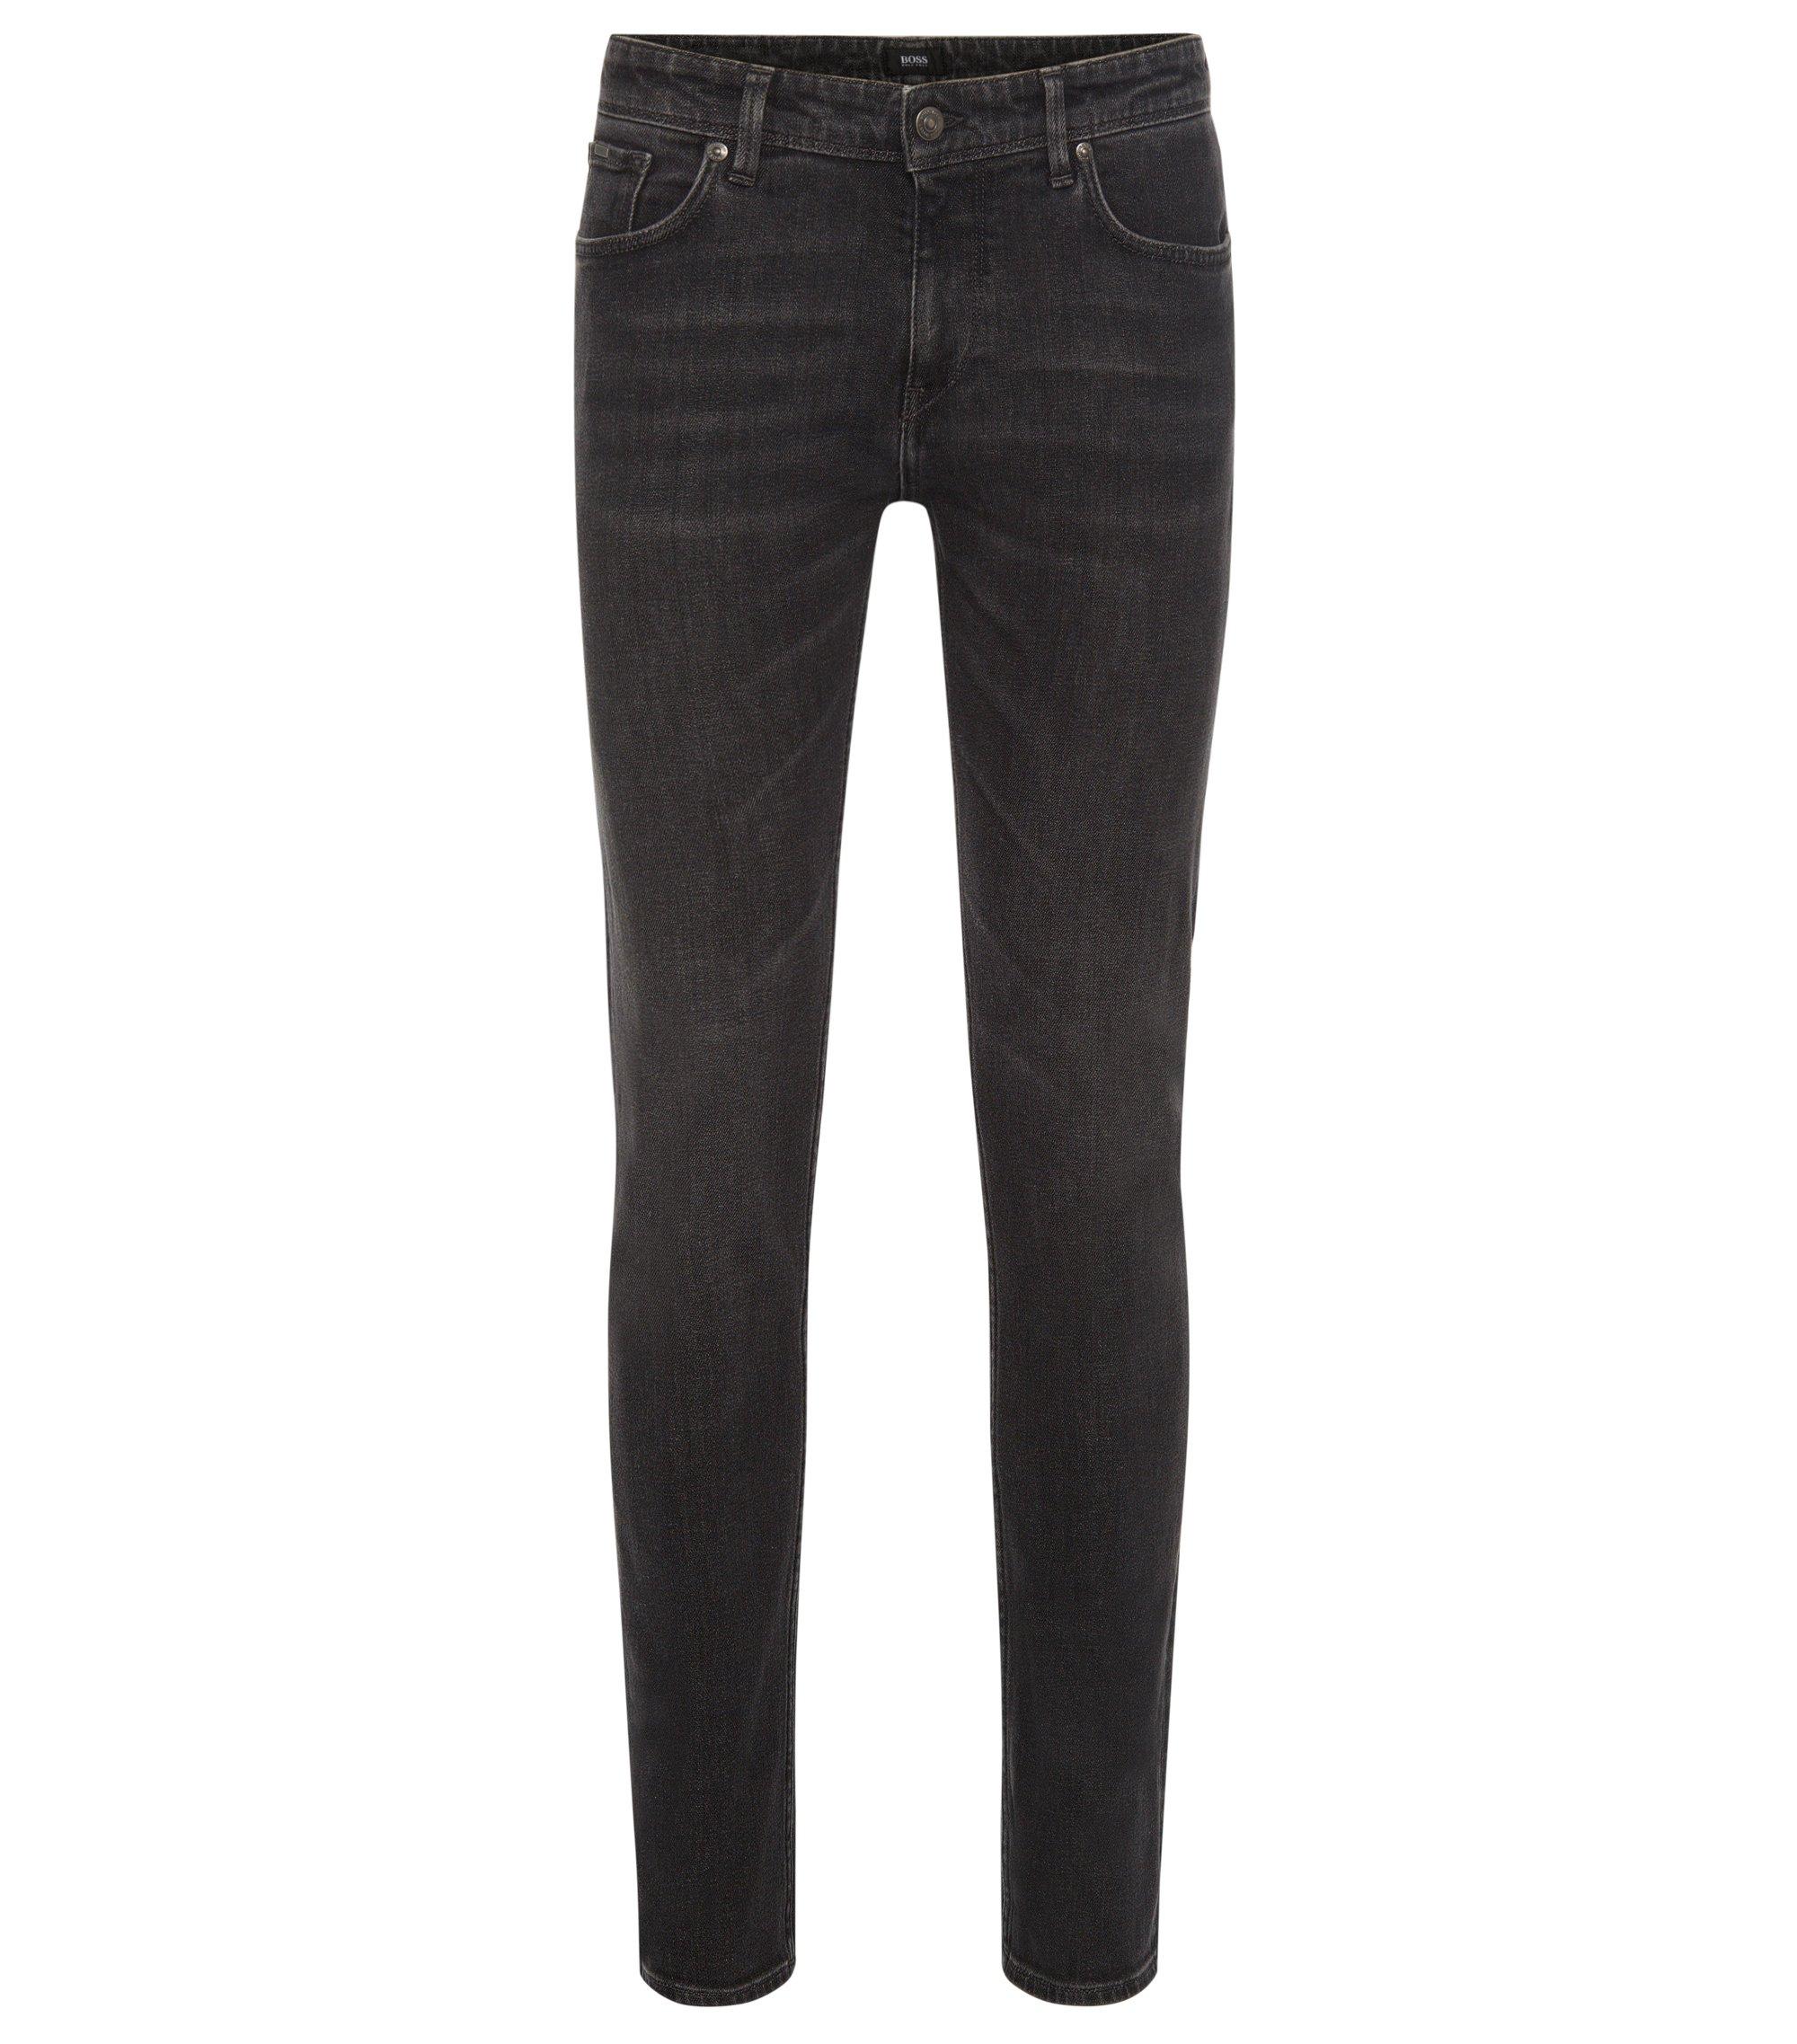 11.25 oz Stretch Cotton Jeans, Slim Fit | Charleston, Charcoal